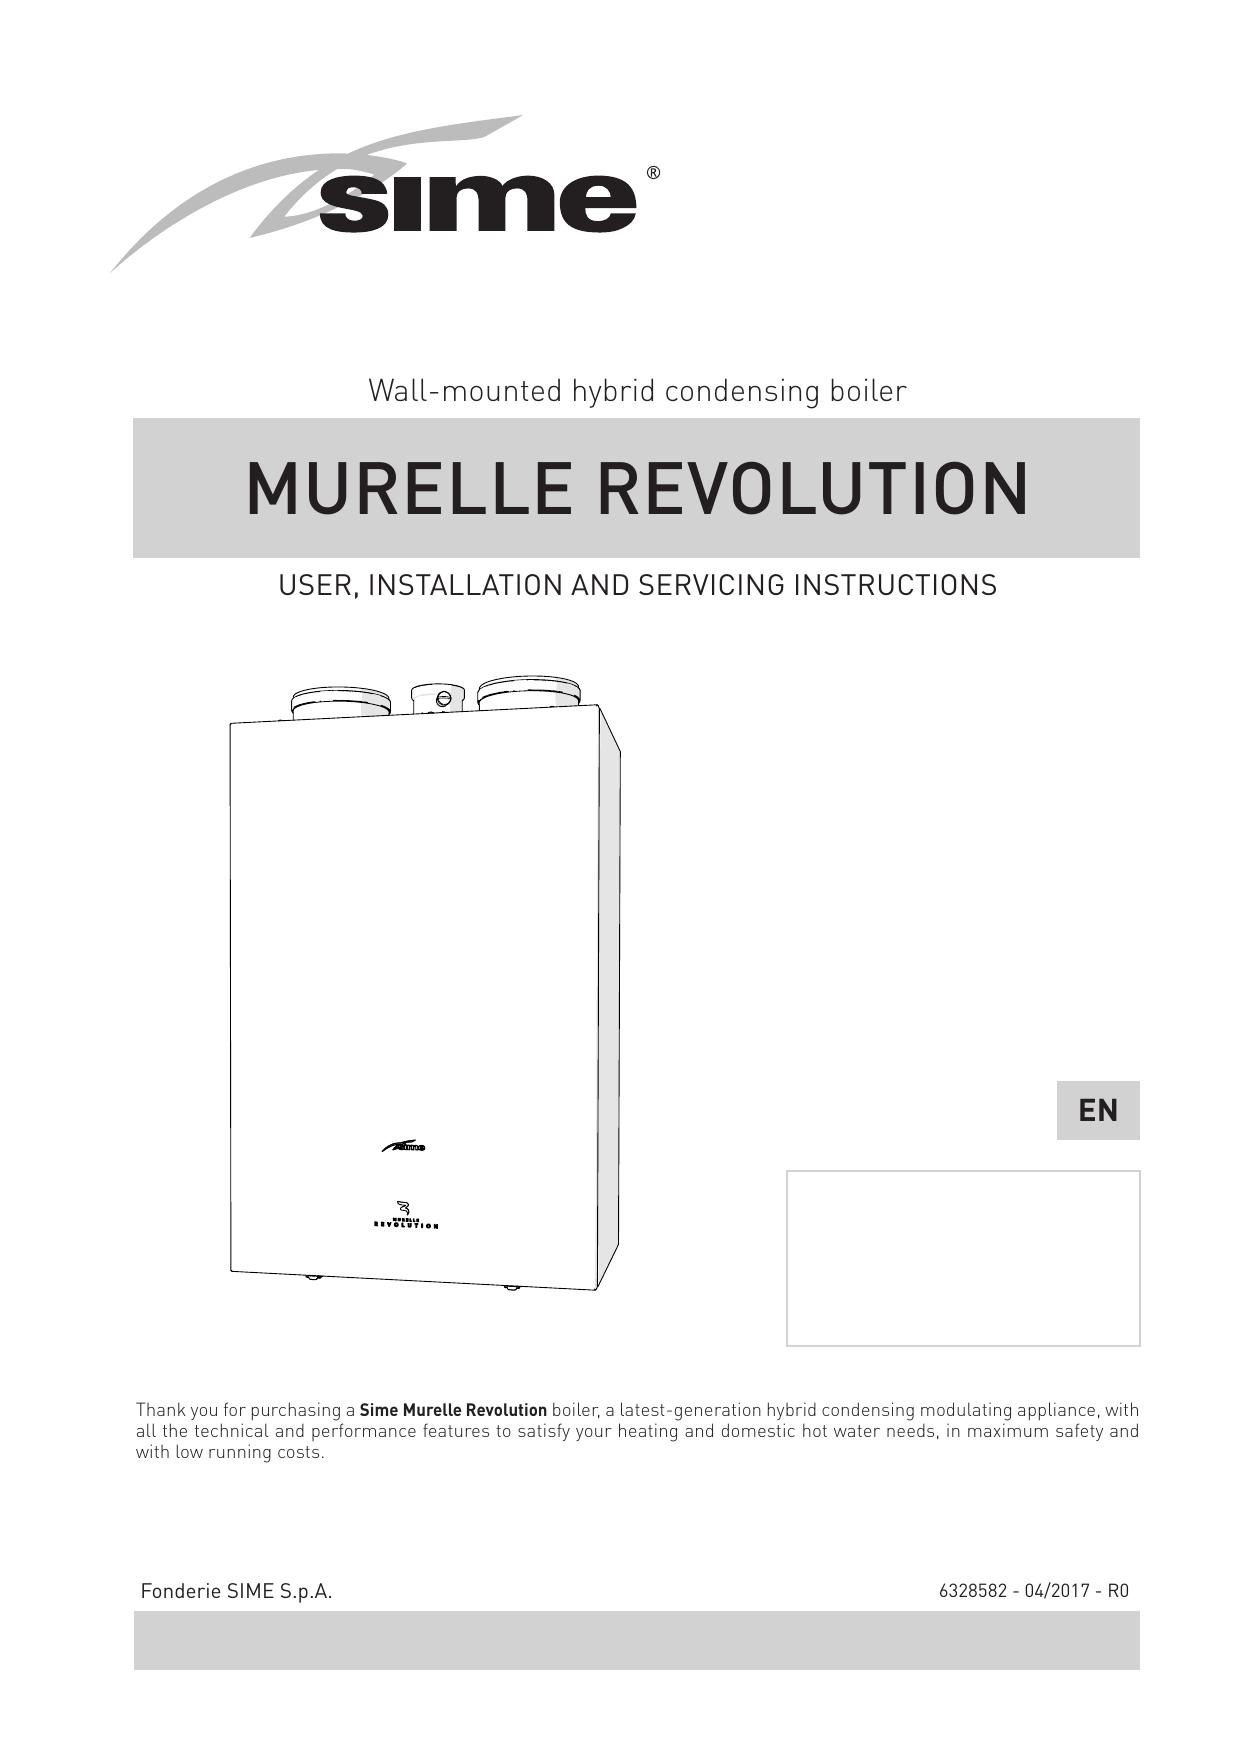 Peachy Murelle Revolution Manualzz Com Wiring 101 Kniepimsautoservicenl